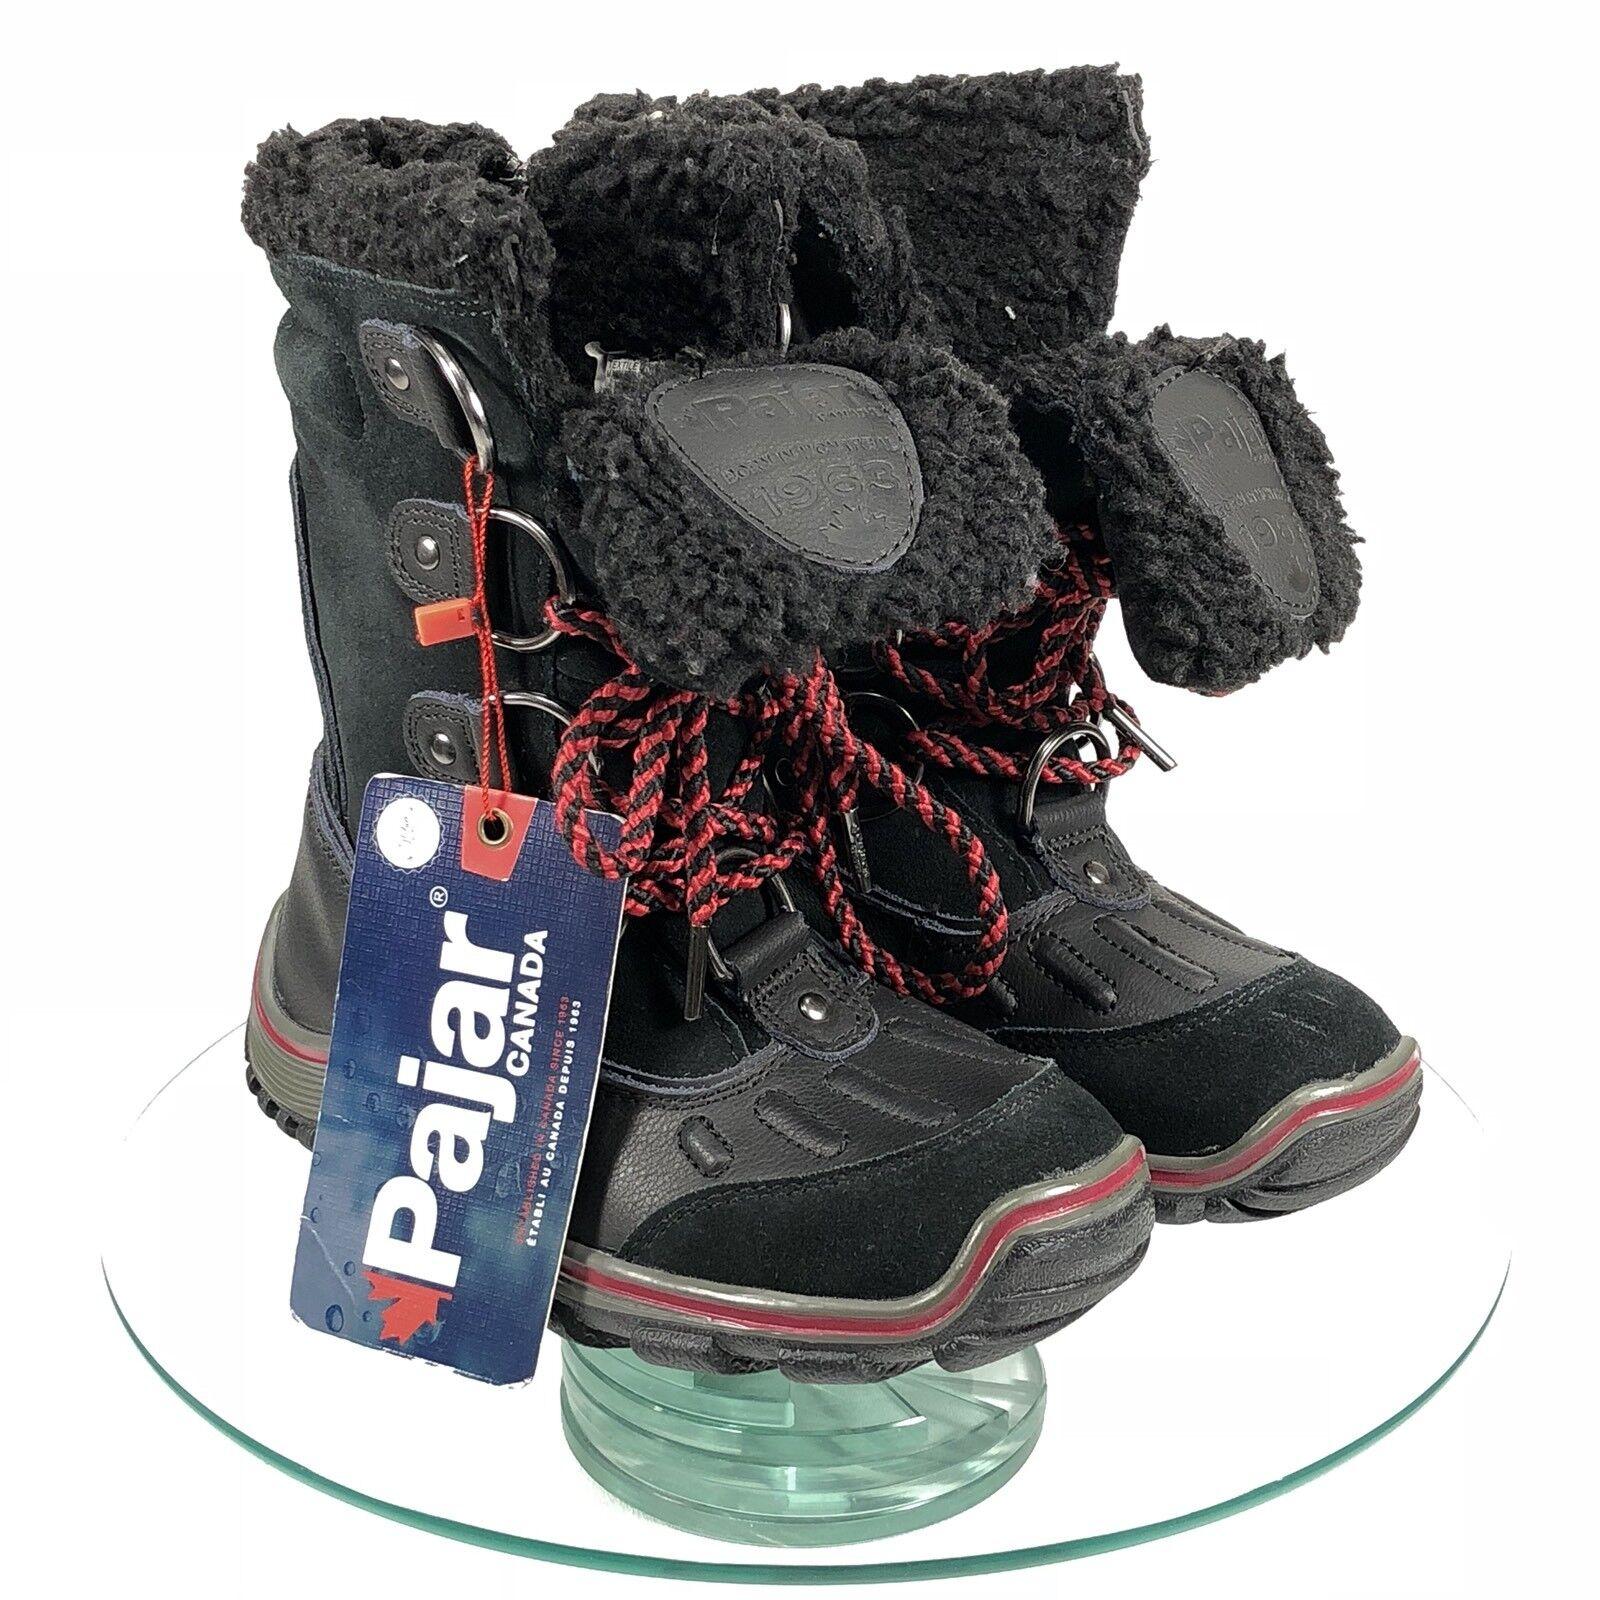 Pajar Canada EU 37 US - 6 - US 6.5 Alina Damenschuhe Winter Stiefel Waterproof Faux Fur aeae46